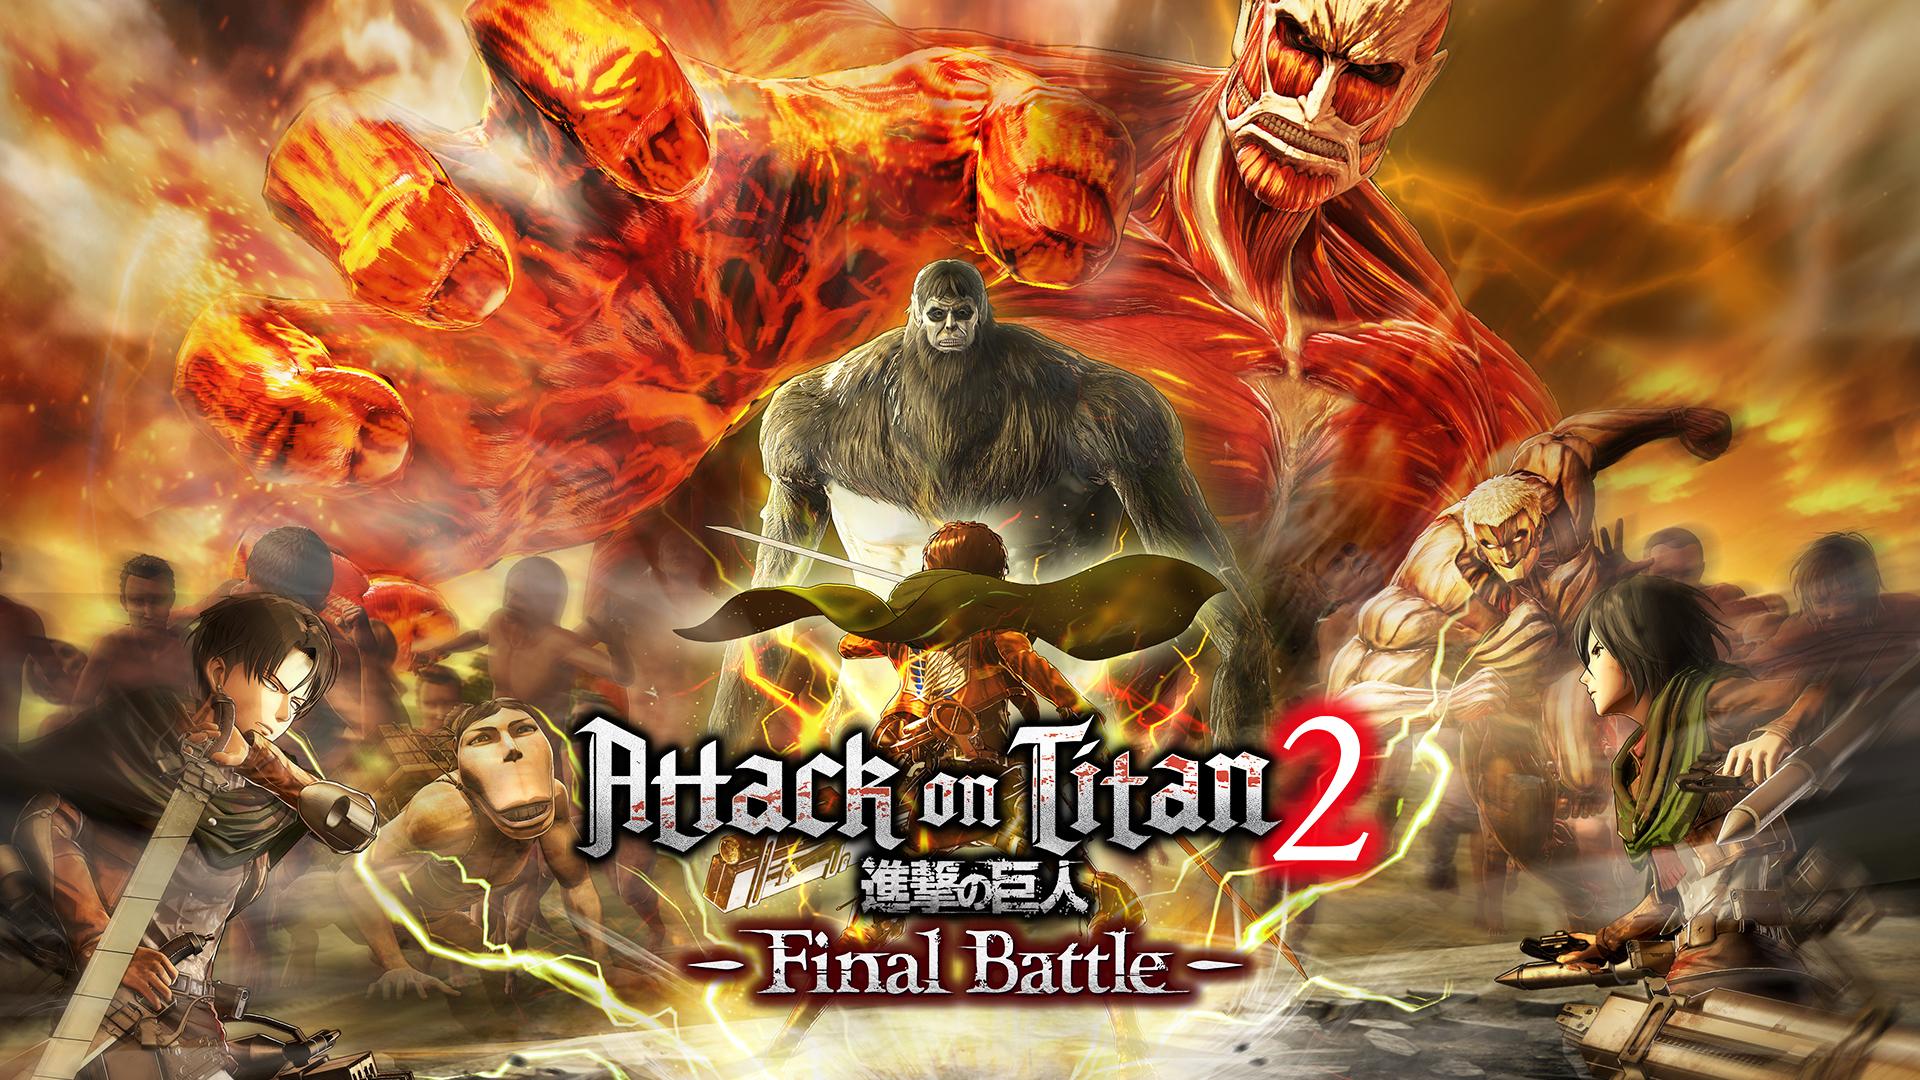 Koei Tecmo Attack on Titan 2 Final Battle Keyart